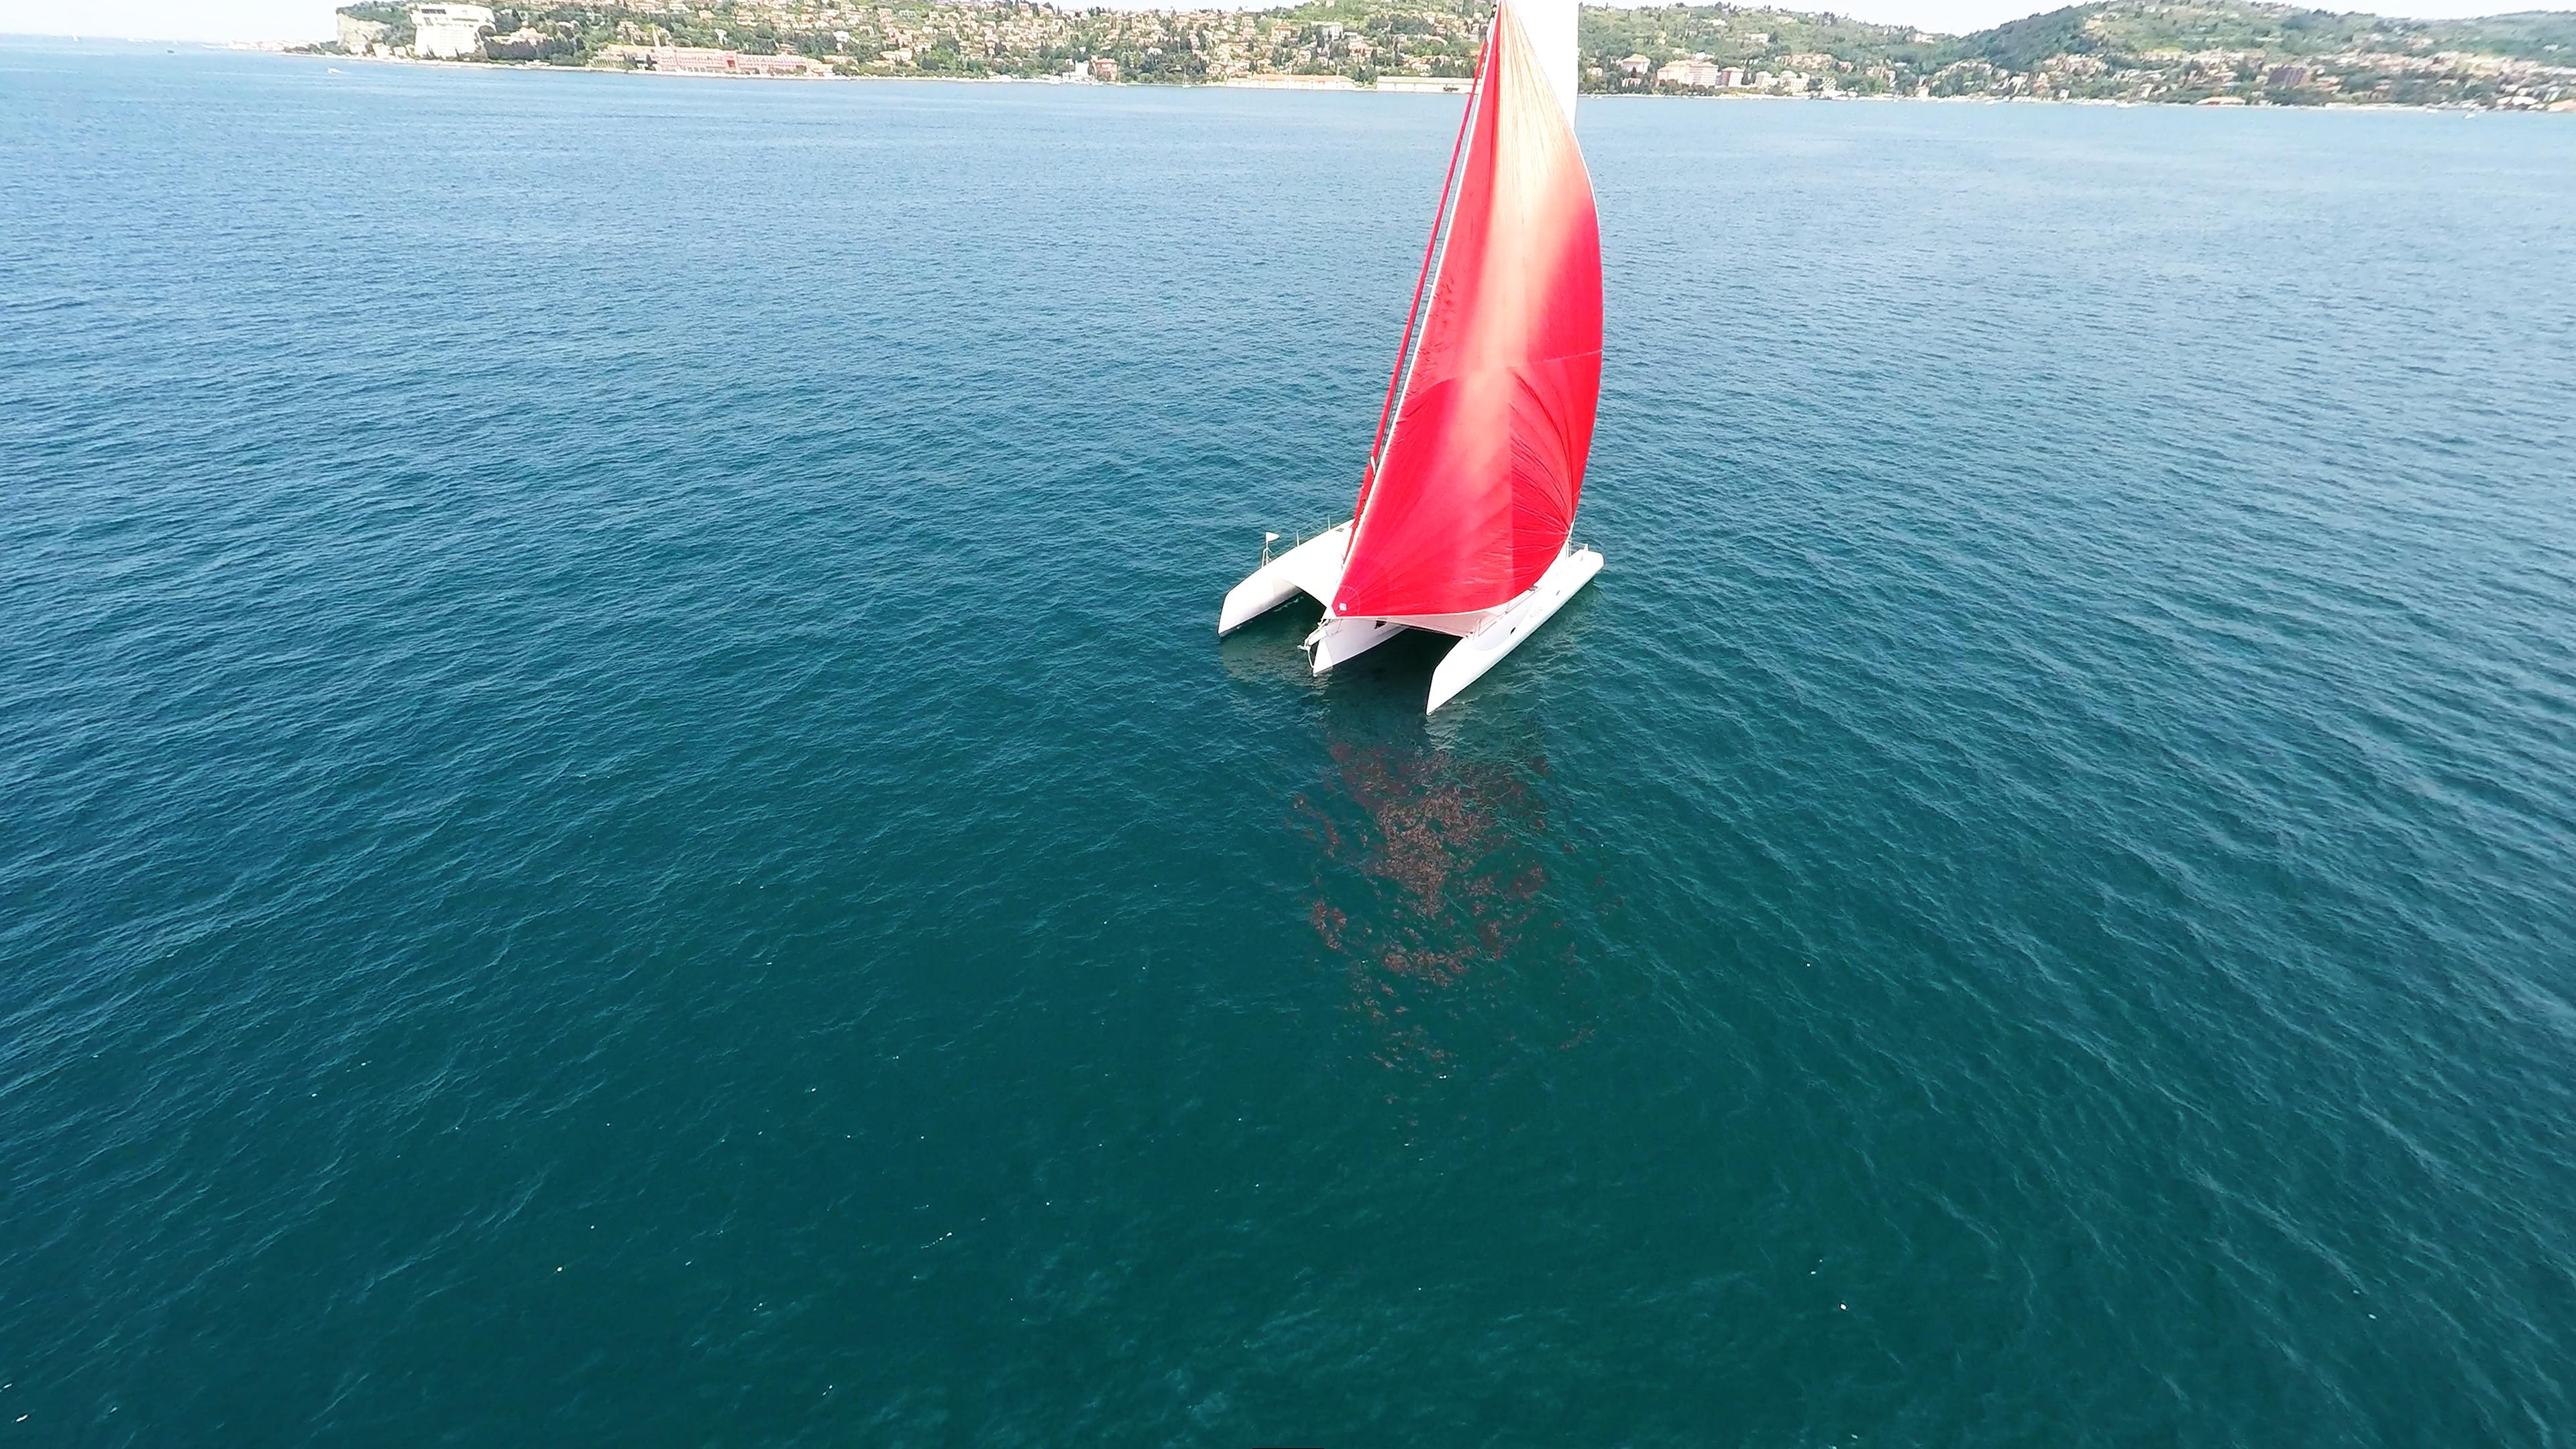 rosso gennaker vela bianco trimarano yacht a noleggio blu mare